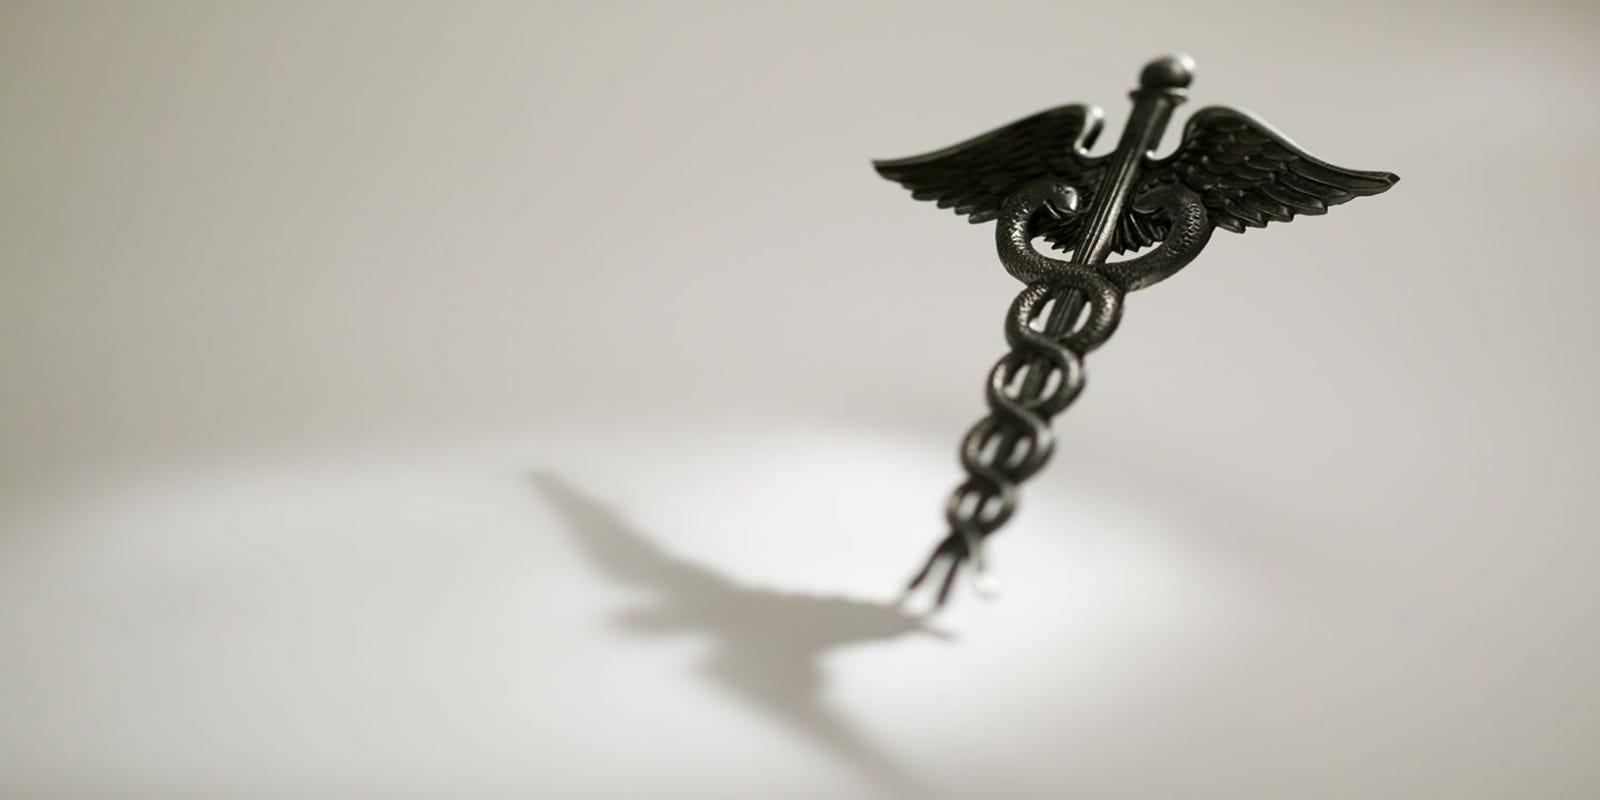 High-dollar jury awards hurt Iowans' access to health care